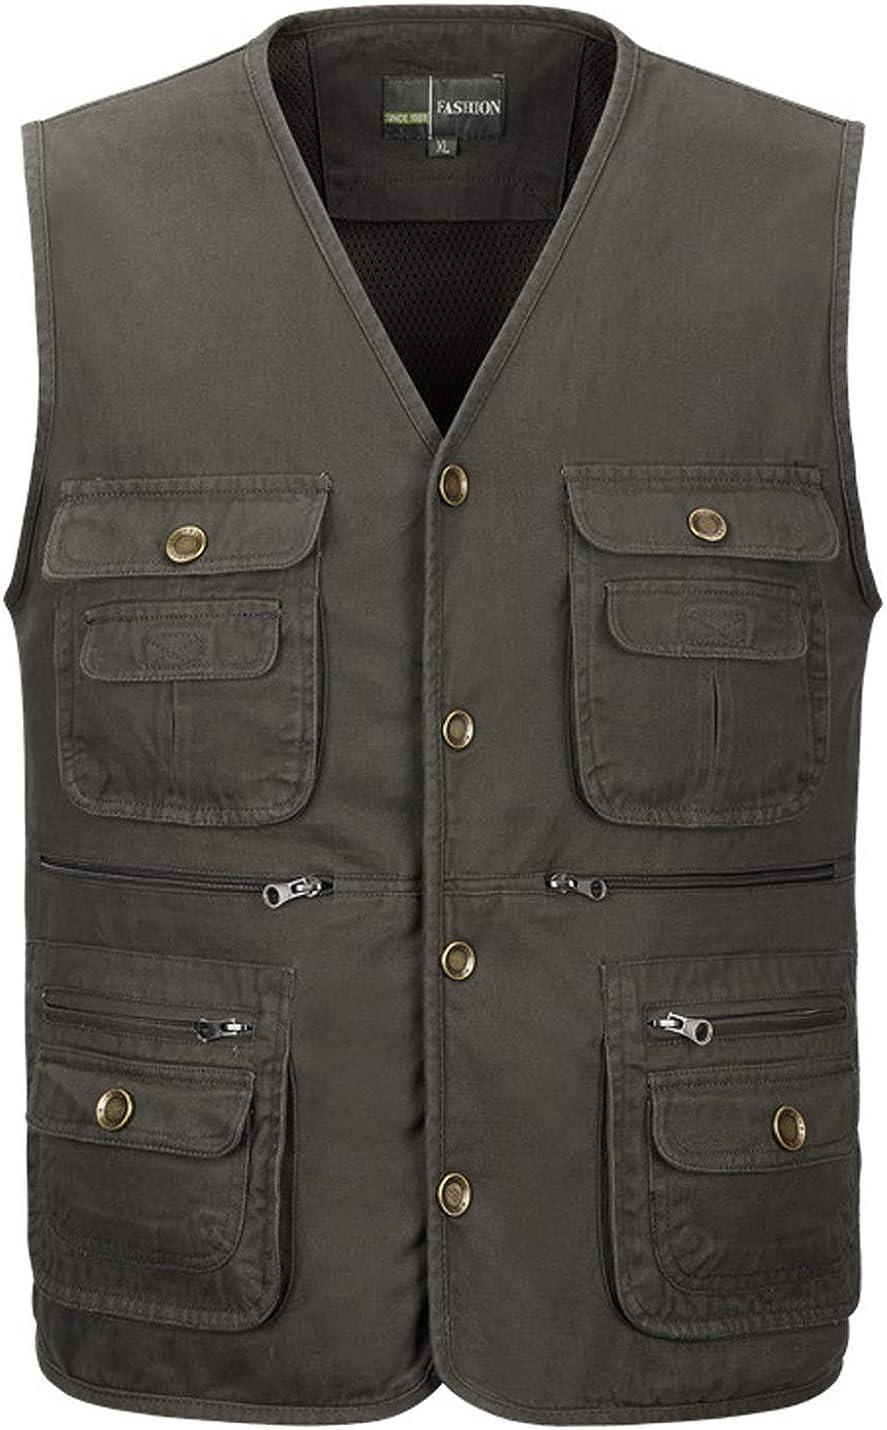 Gihuo Men's Cotton Multi-Pocket Safari Fishing Travel Vest